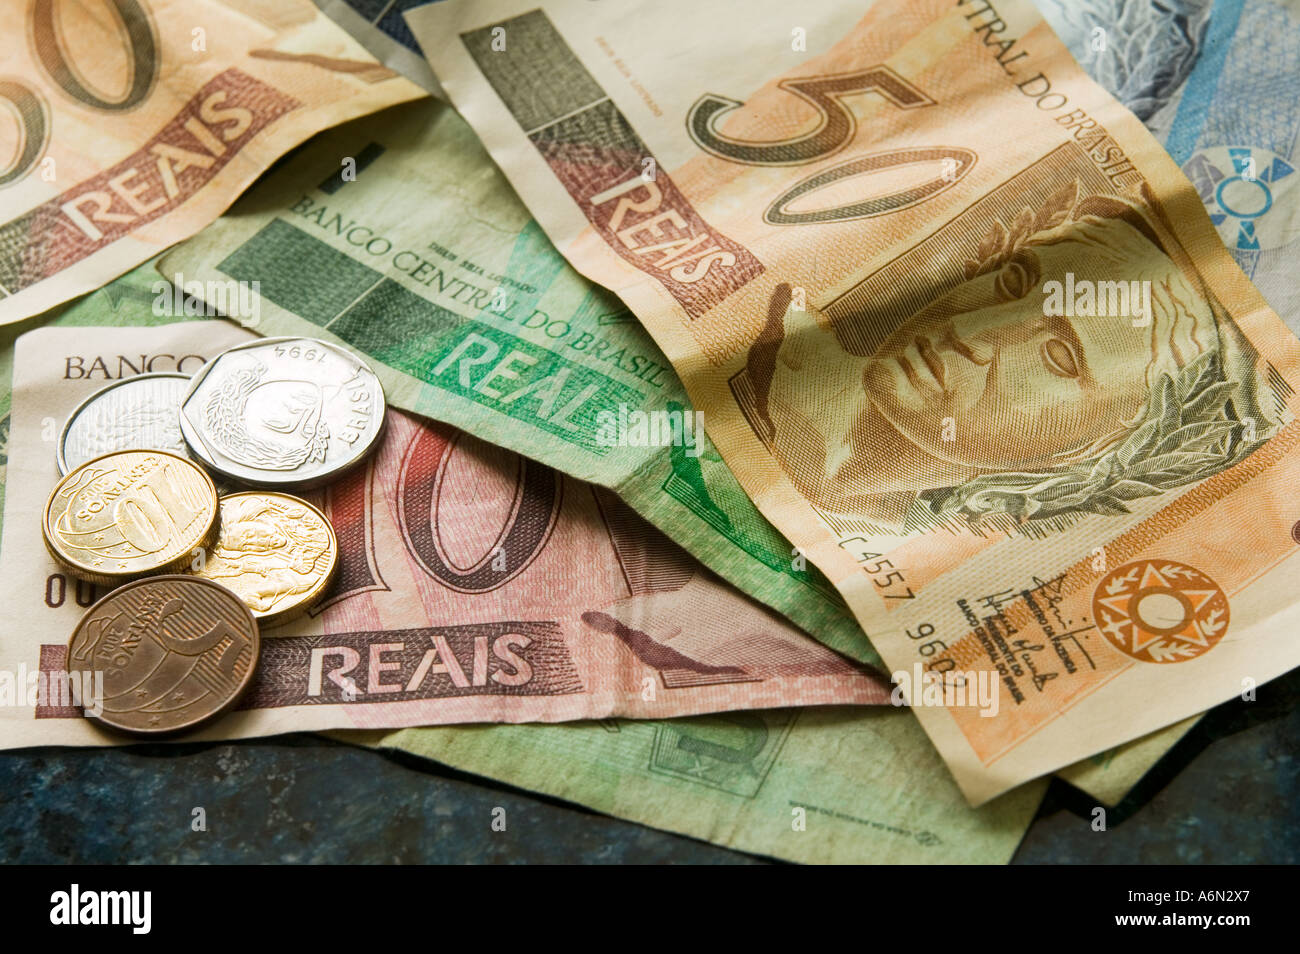 Brazilian currency real s stock photo 6636326 alamy brazilian currency real s biocorpaavc Image collections